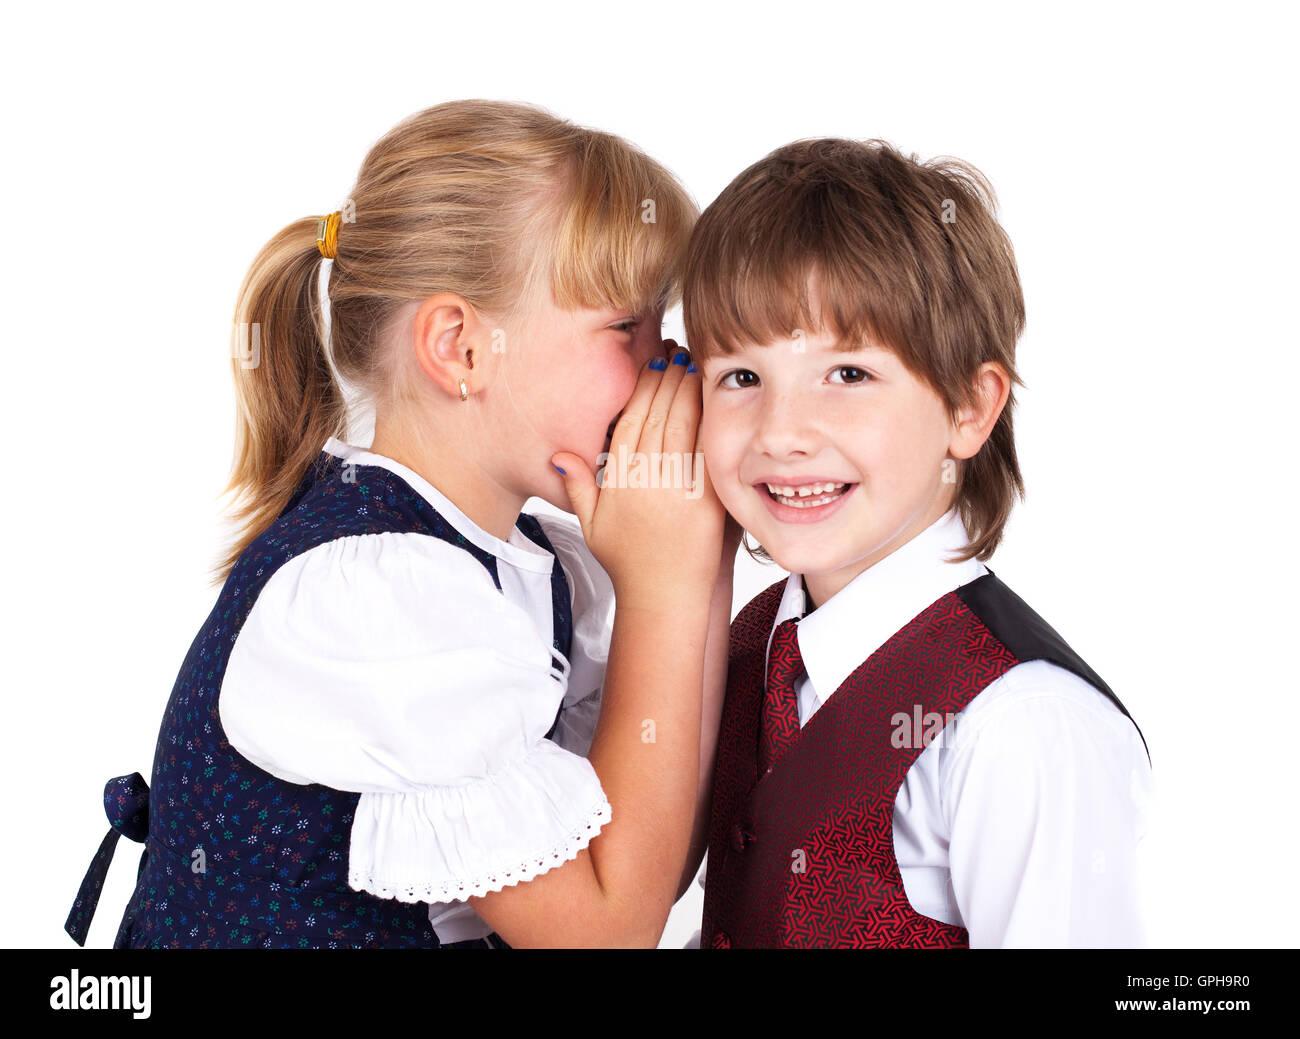 two little kids telling secrets - Images Of Little Kids